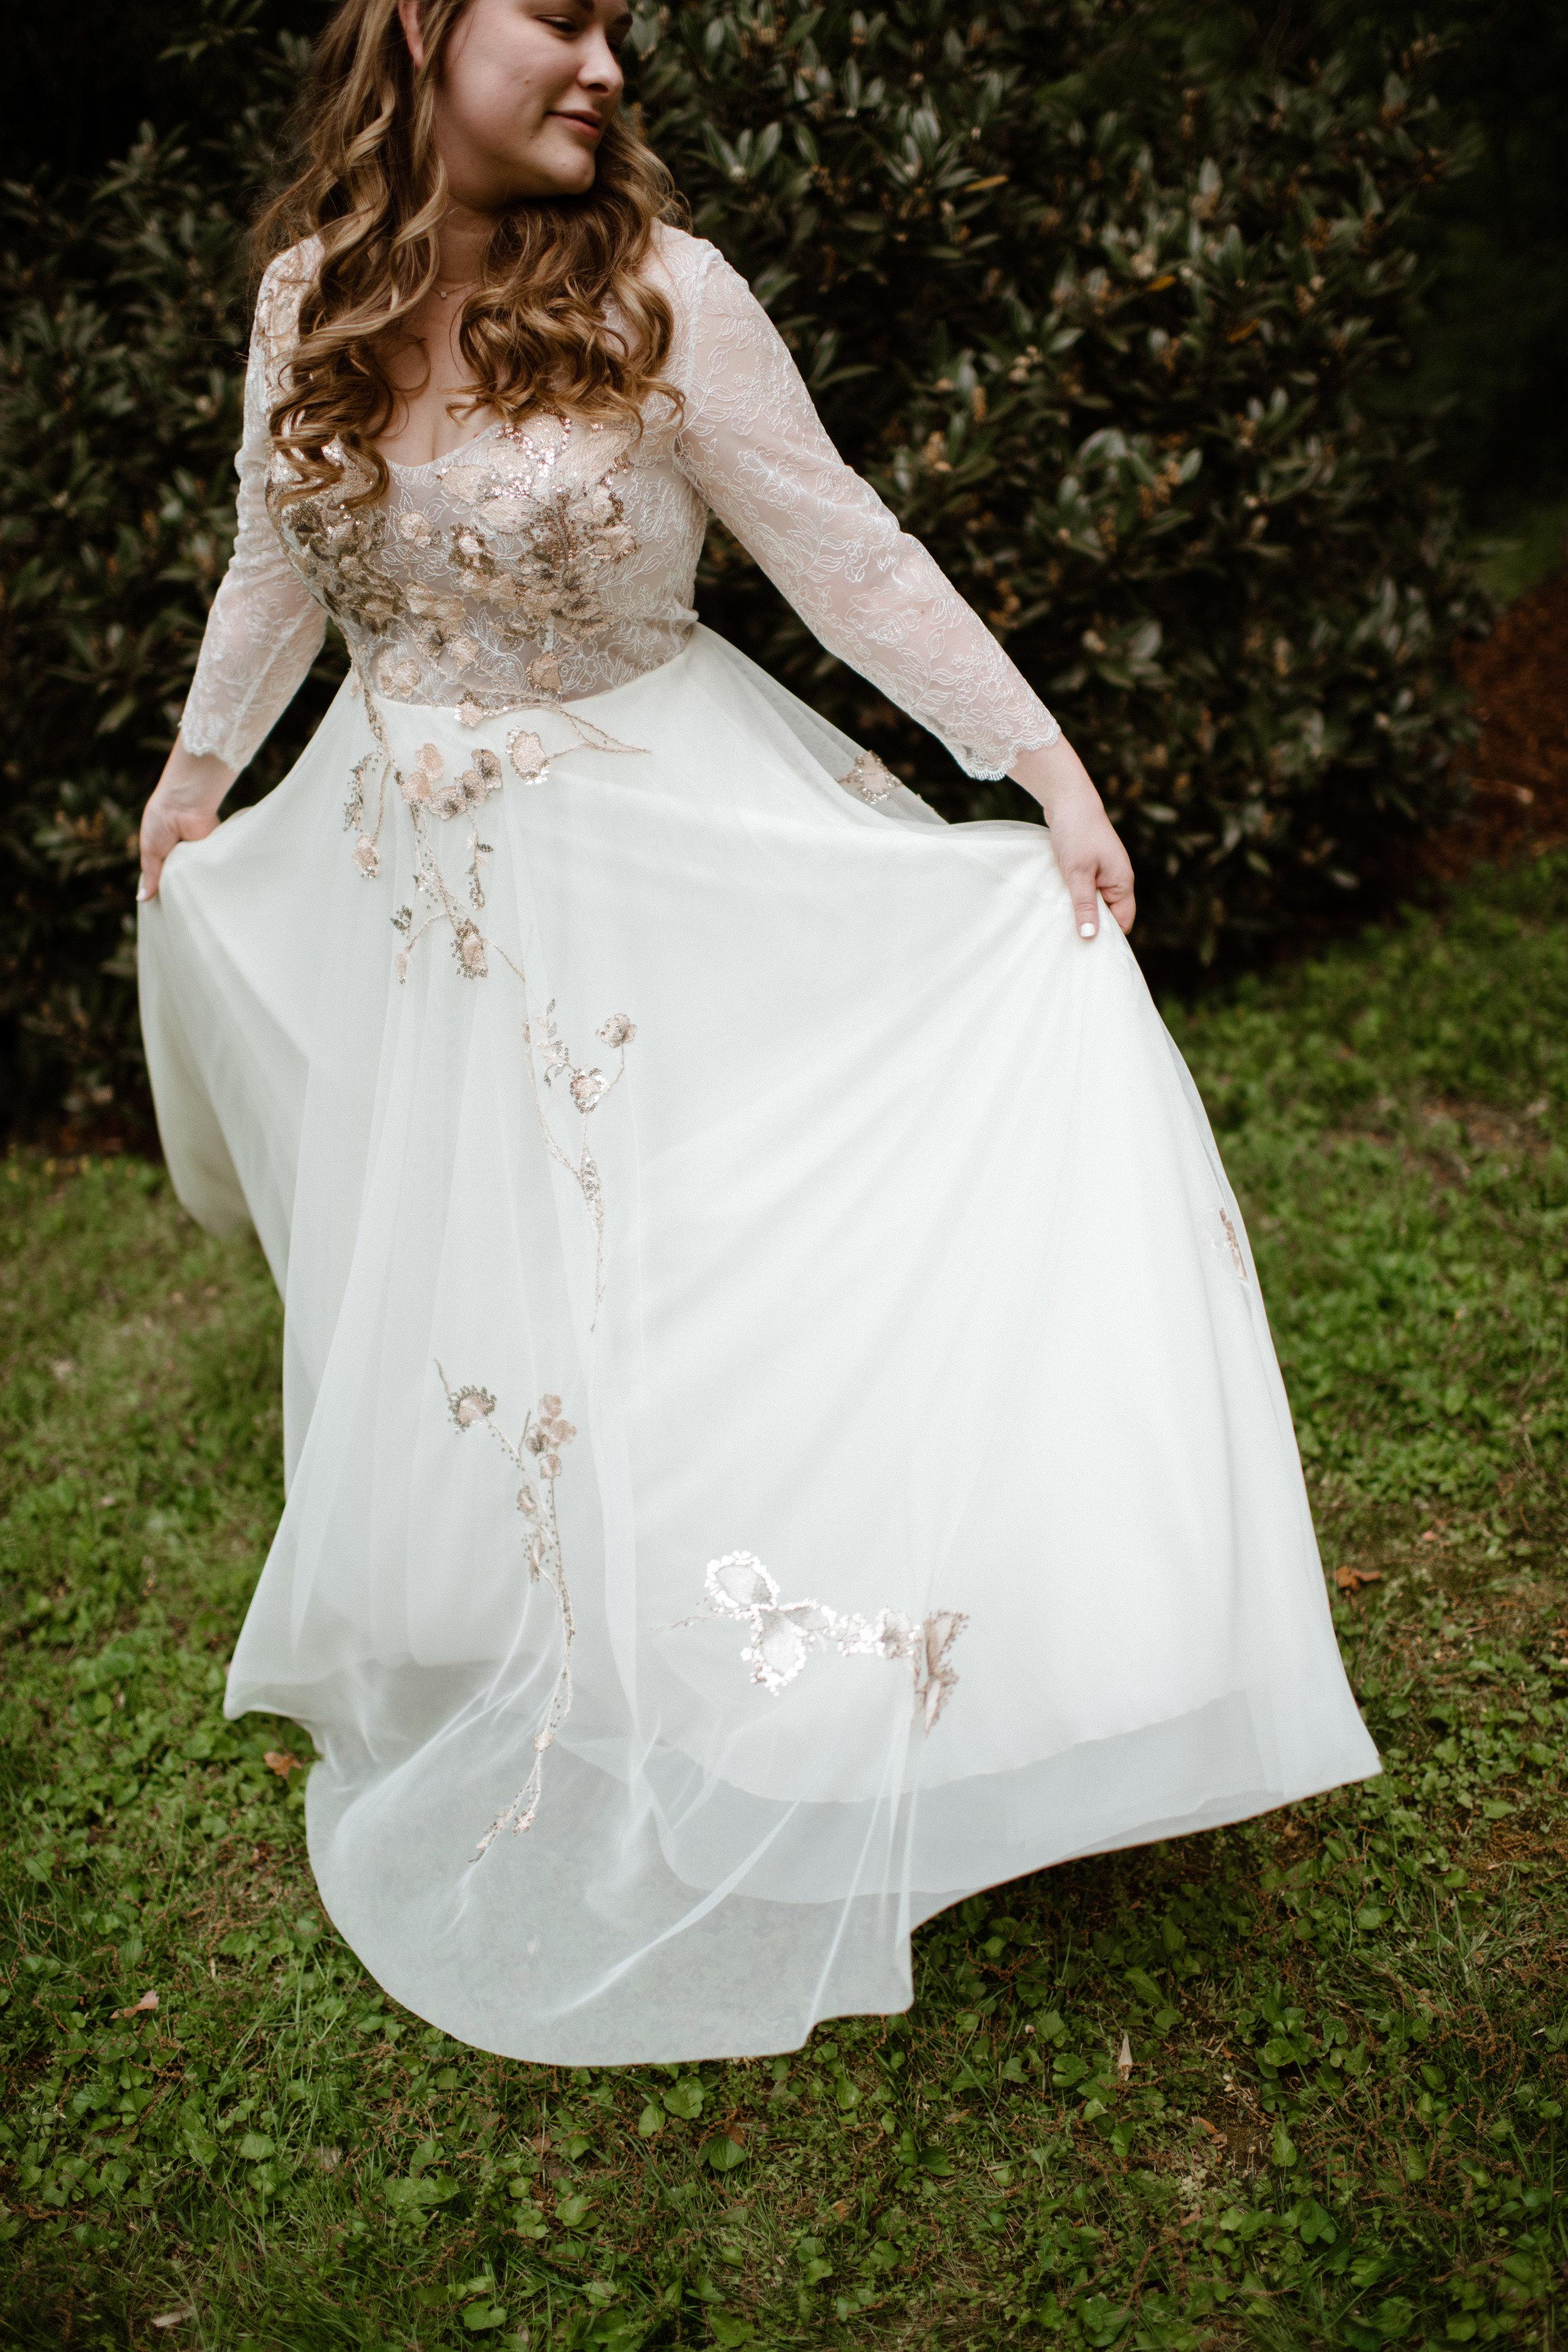 Elizabeth and Aldens Intimate Backyard wedding in Nashville Tennessee Wedding Photographer00005.jpg